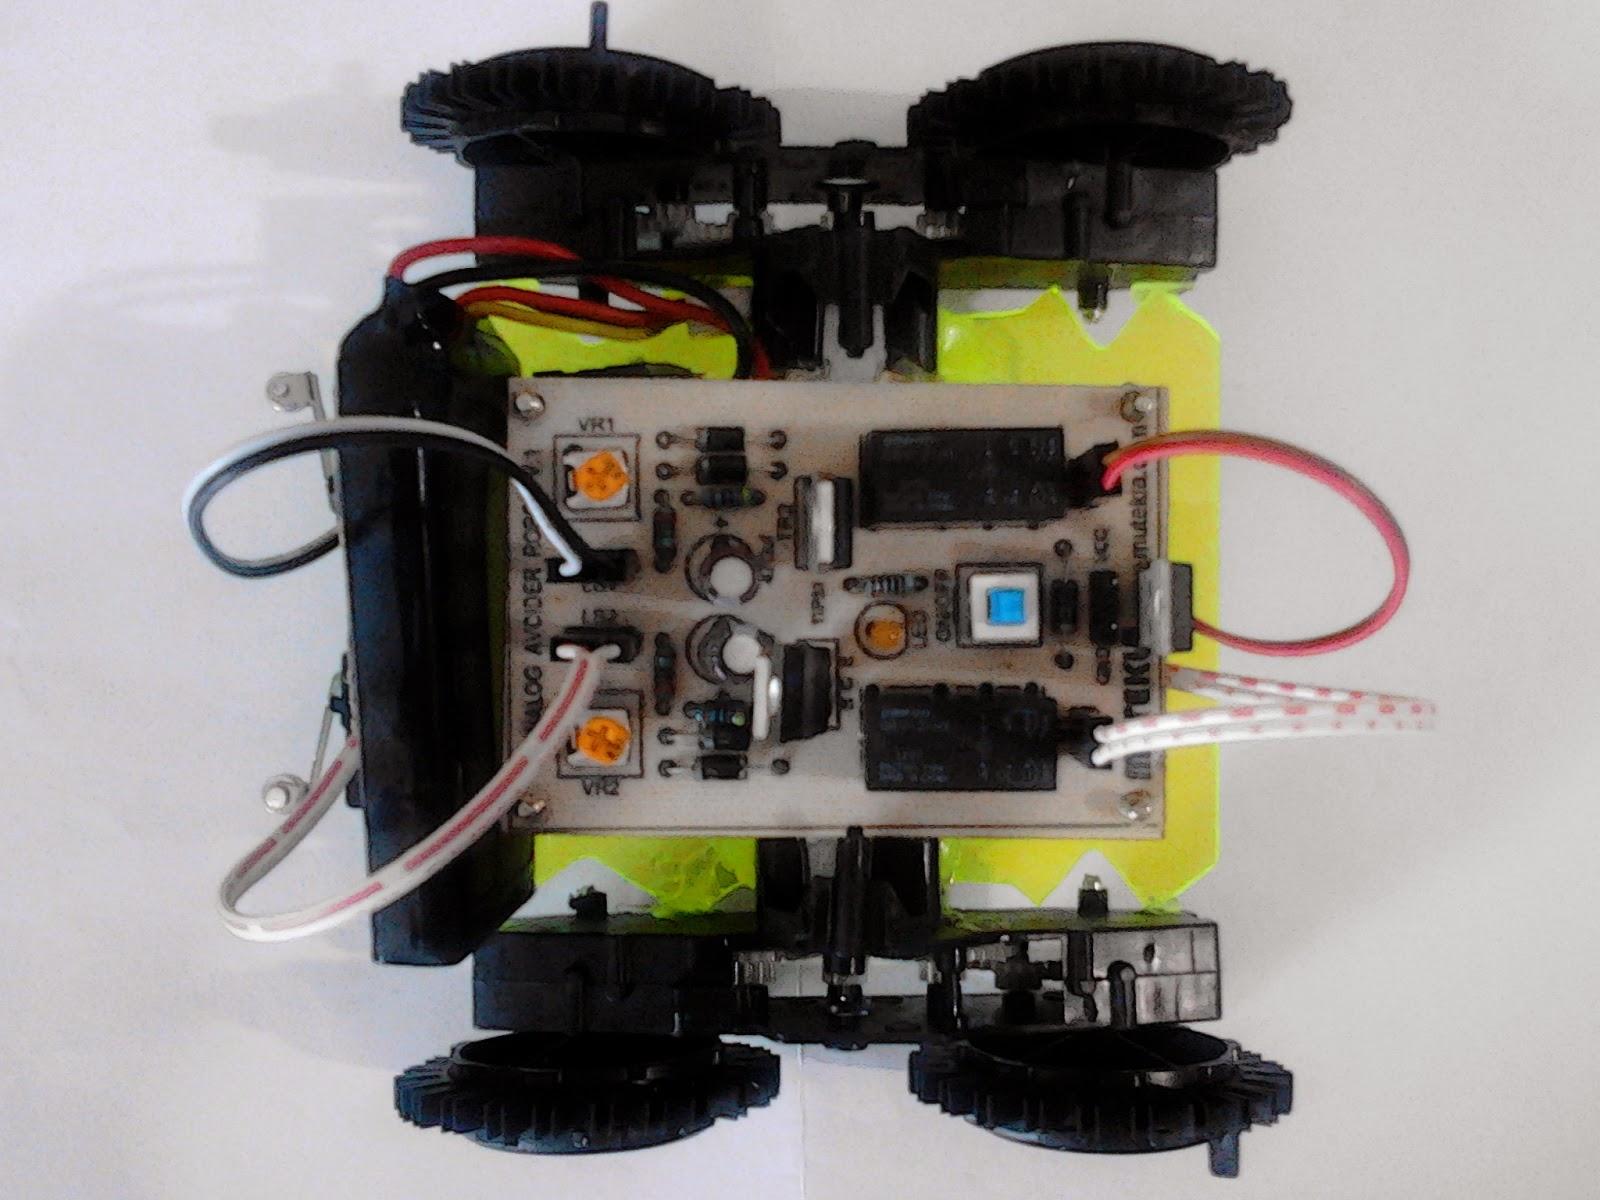 Cara membuat robot sederhana dari barang bekas tanpa